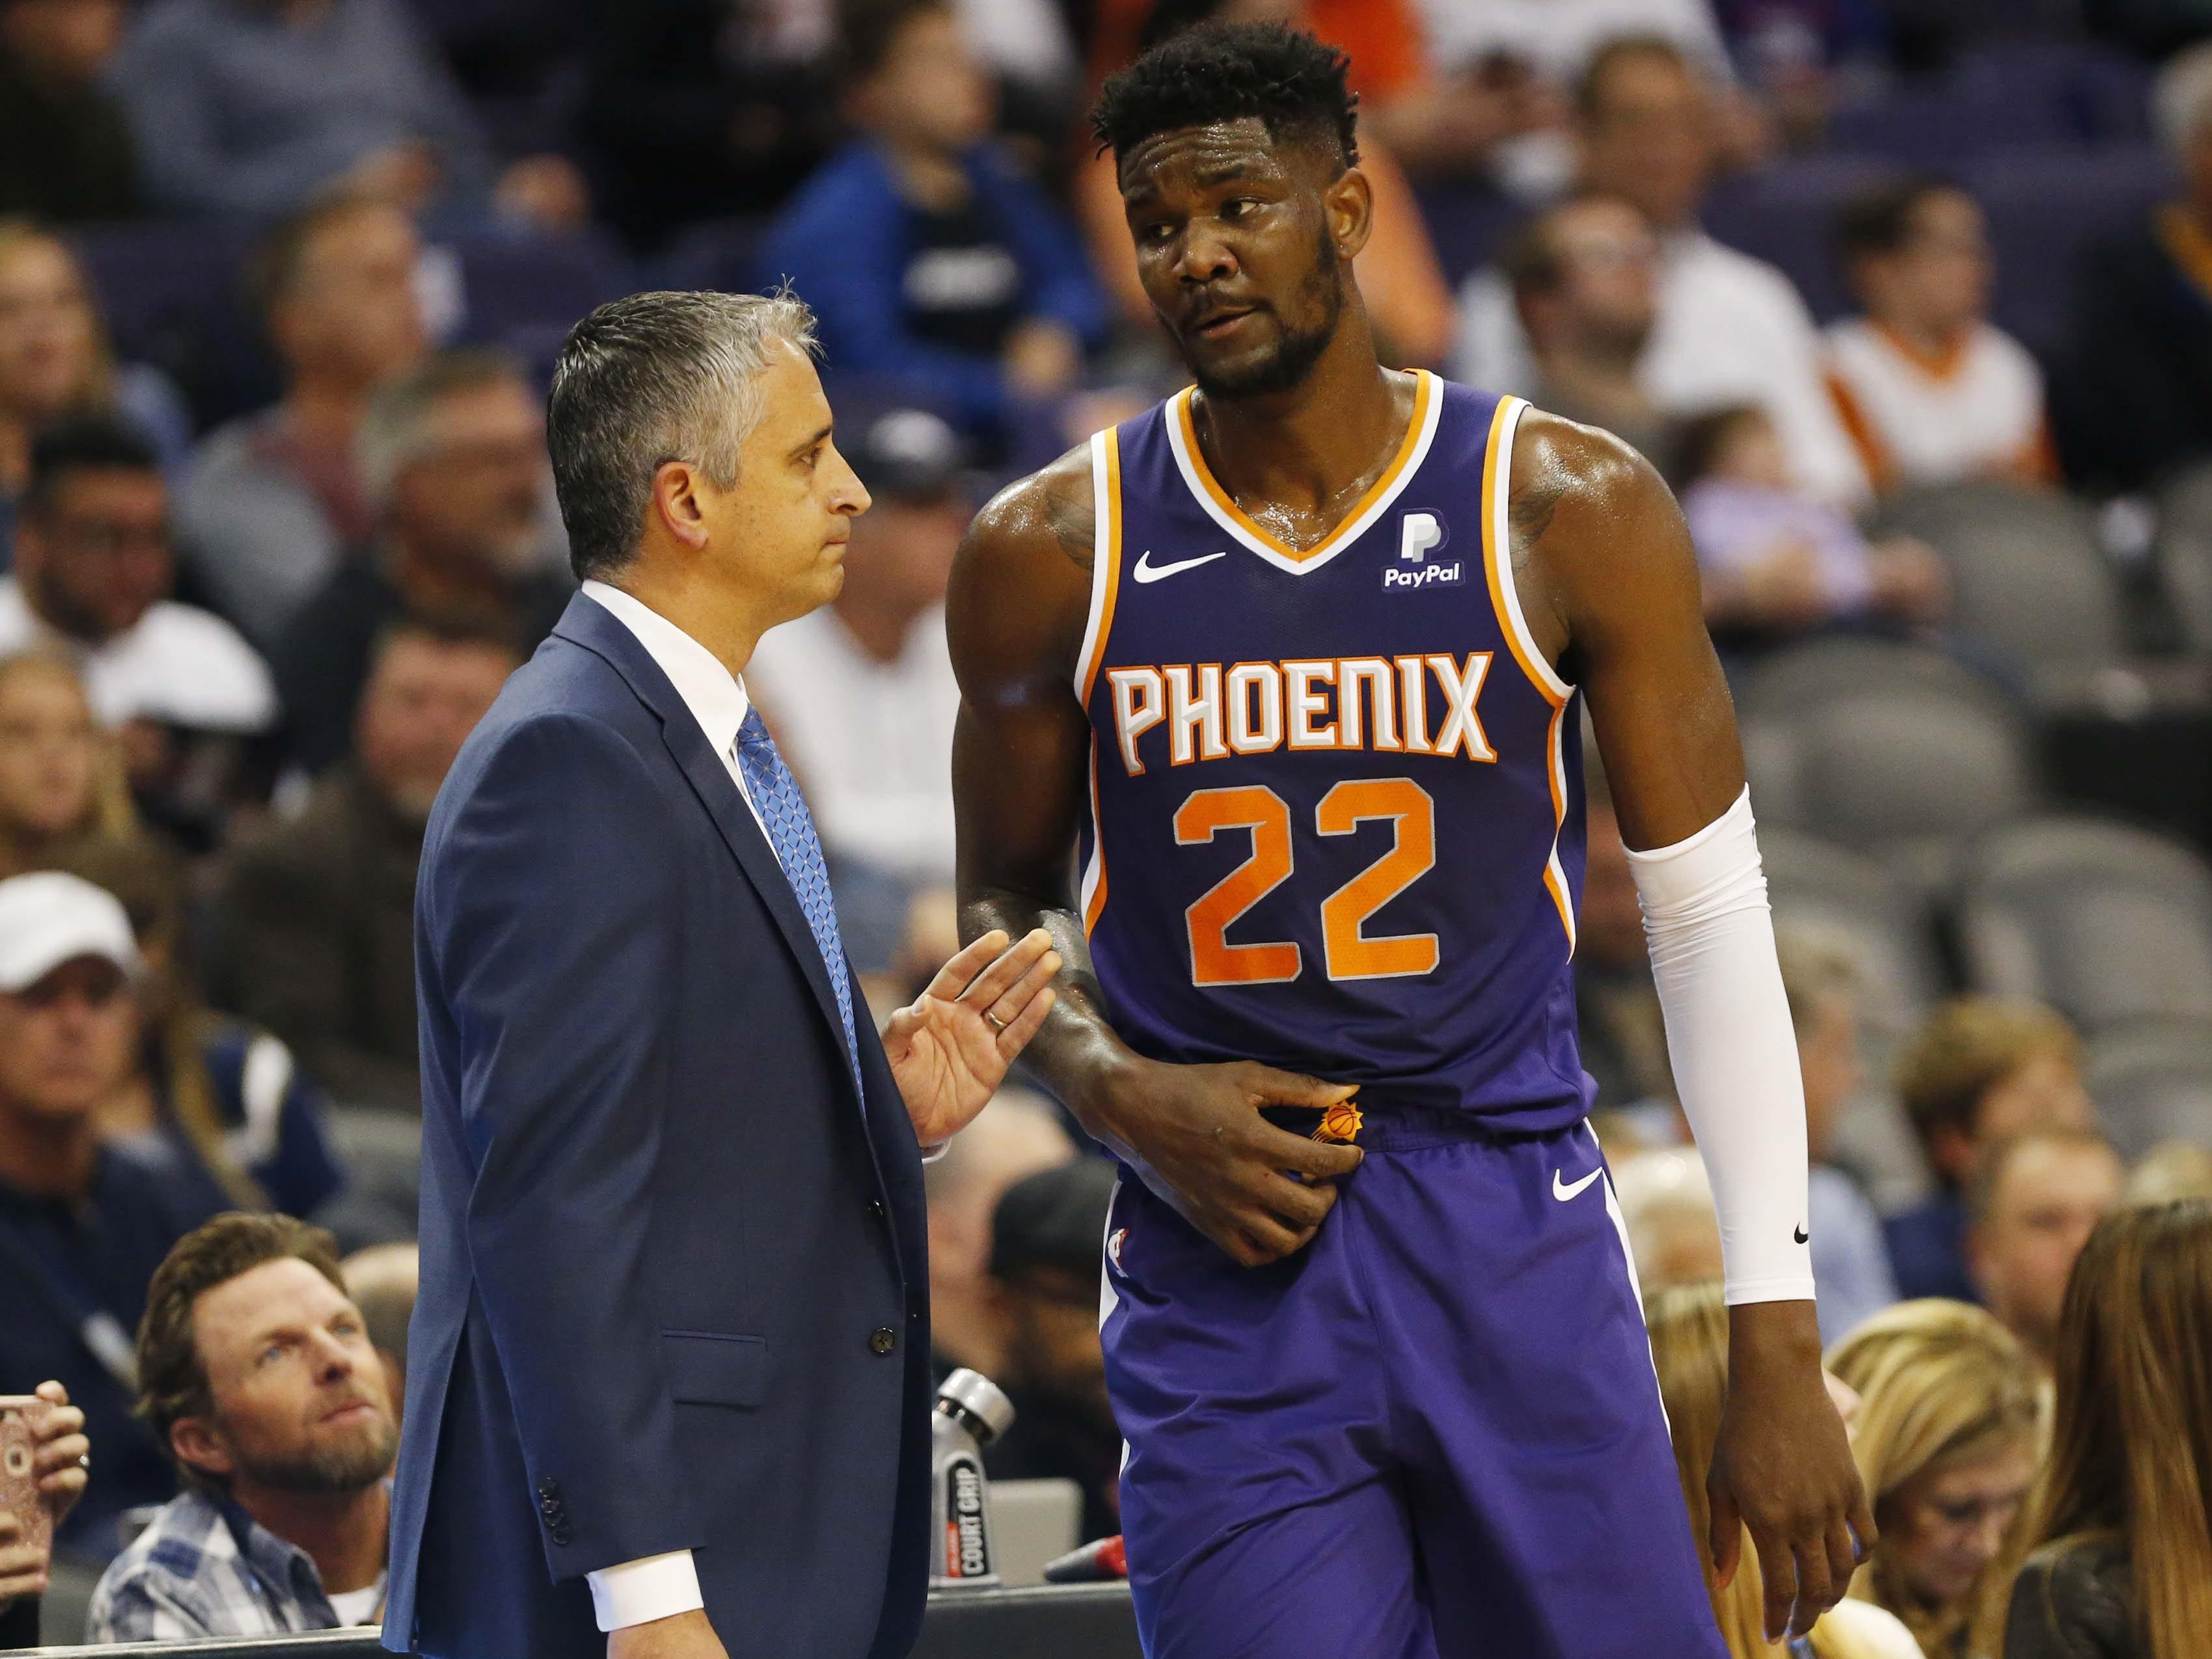 Phoenix Suns head coach Igor Kokoskov talks with Phoenix Suns center Deandre Ayton (22) during the first quarter against the Charlotte Hornets in Phoenix January 6, 2019.